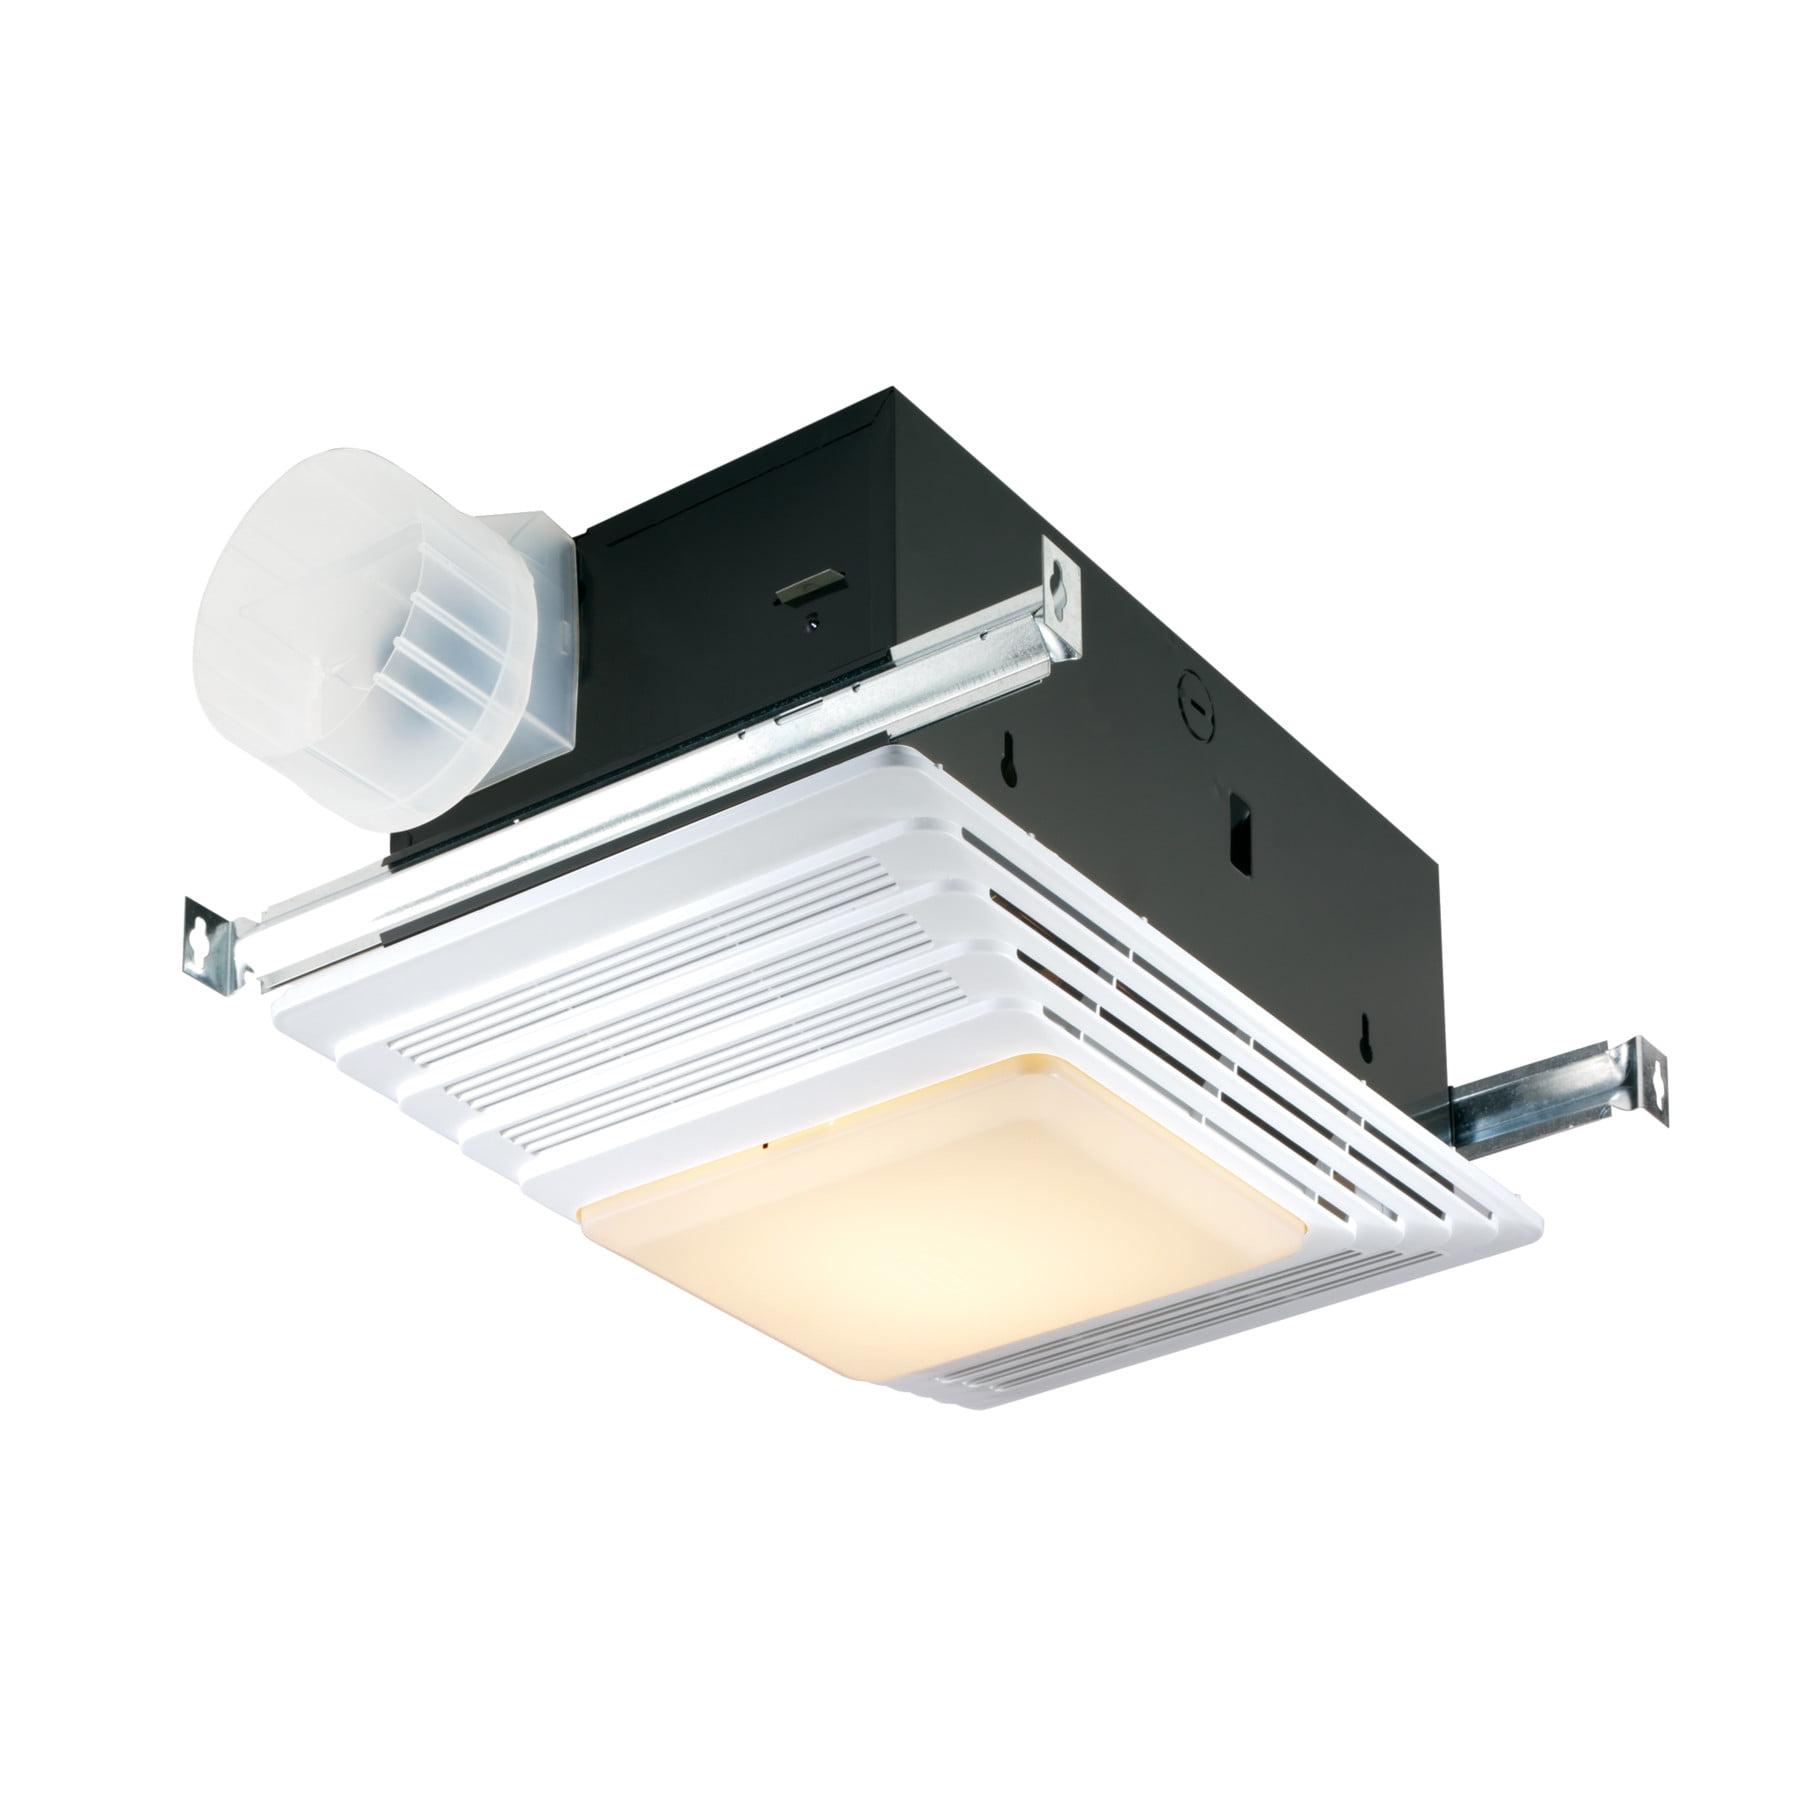 Heater Ventilation Fan Light, Bathroom Vent Heater And Light